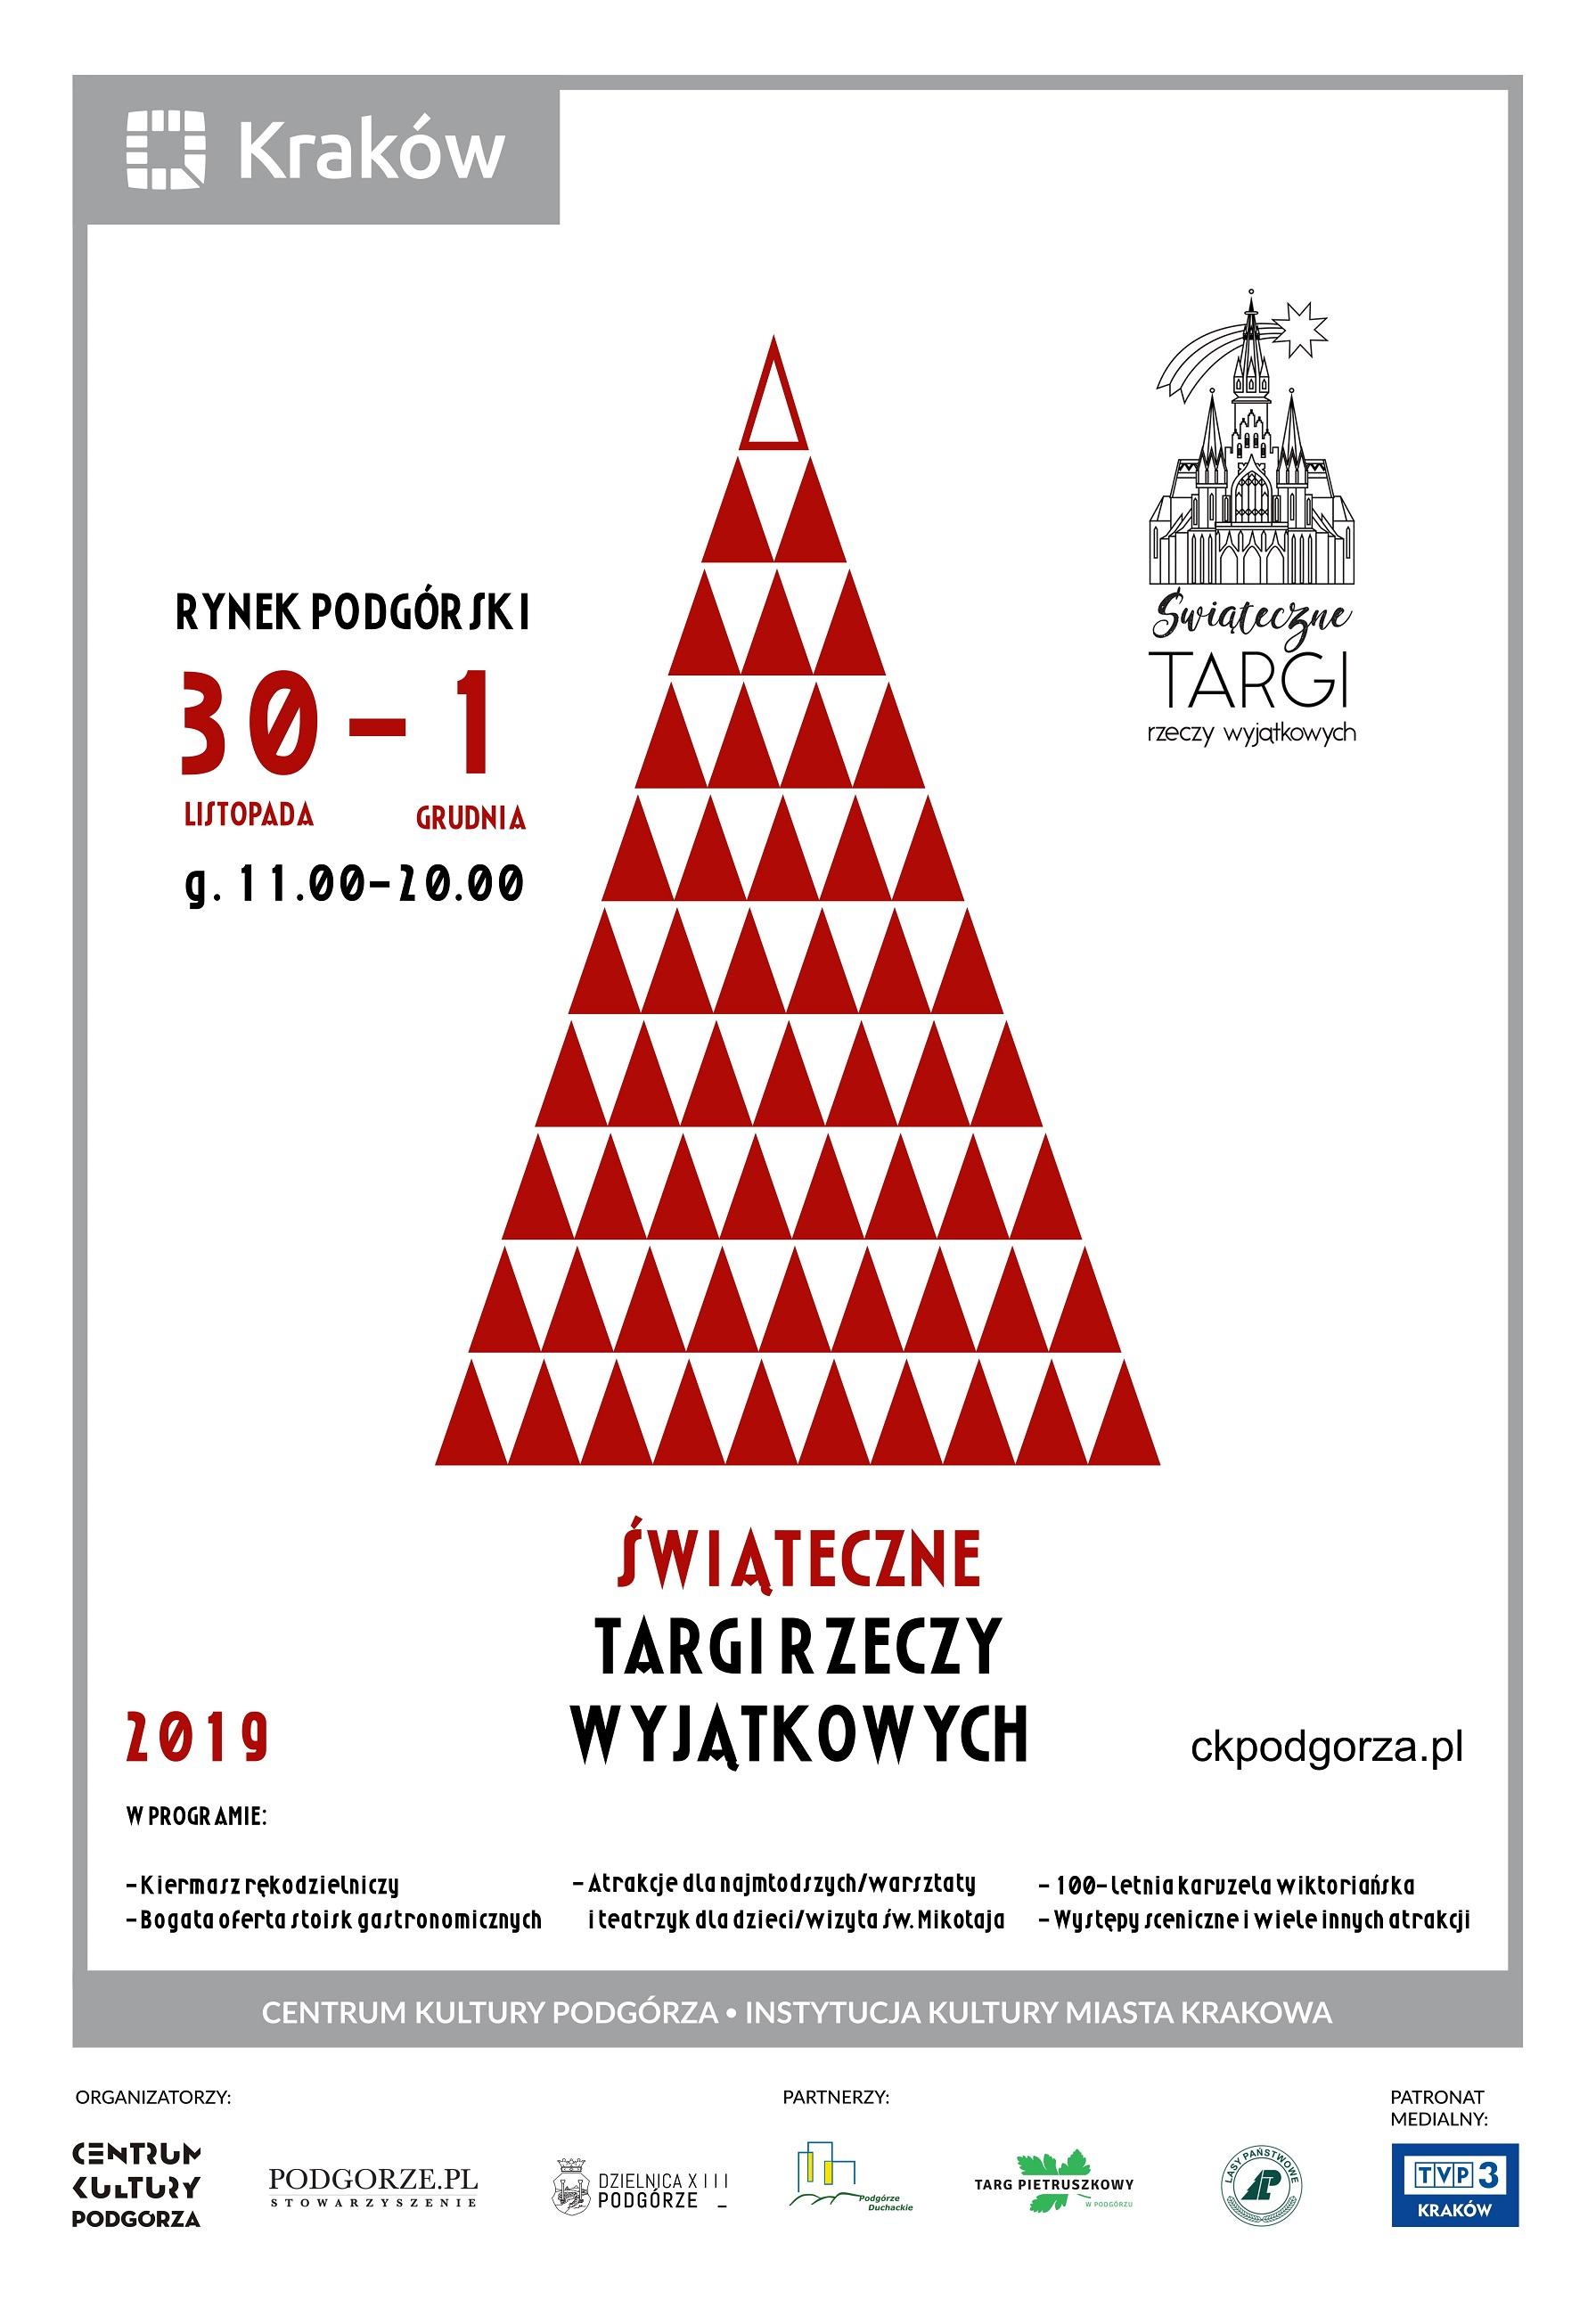 http://podgorze.pl/wp-content/uploads/2019/11/Targi-swiateczne_2019.jpg